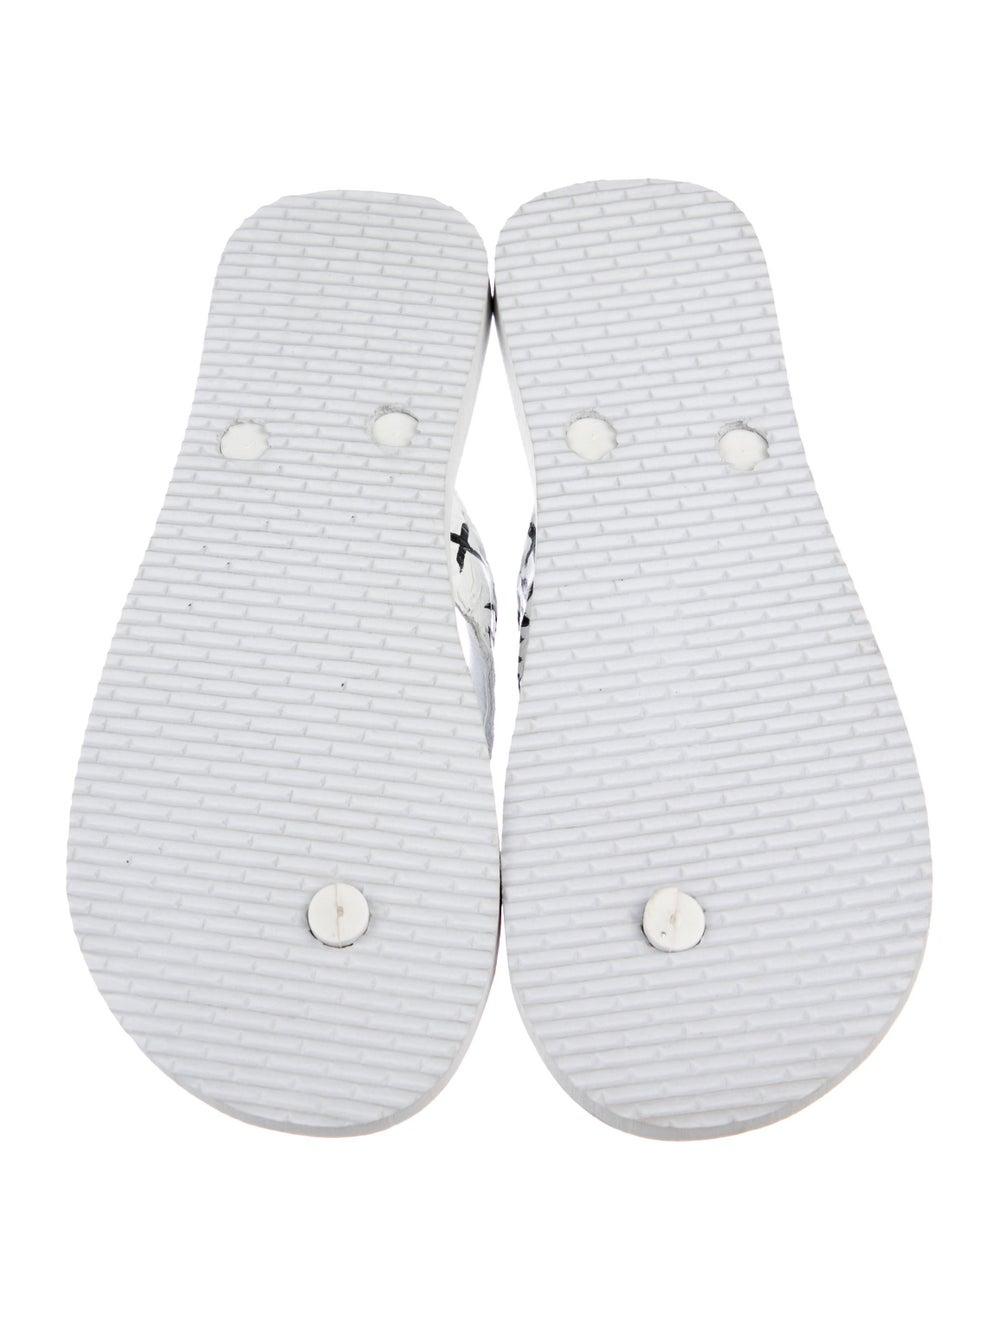 Rhonda Ochs Crocodile Thong Sandals White - image 5